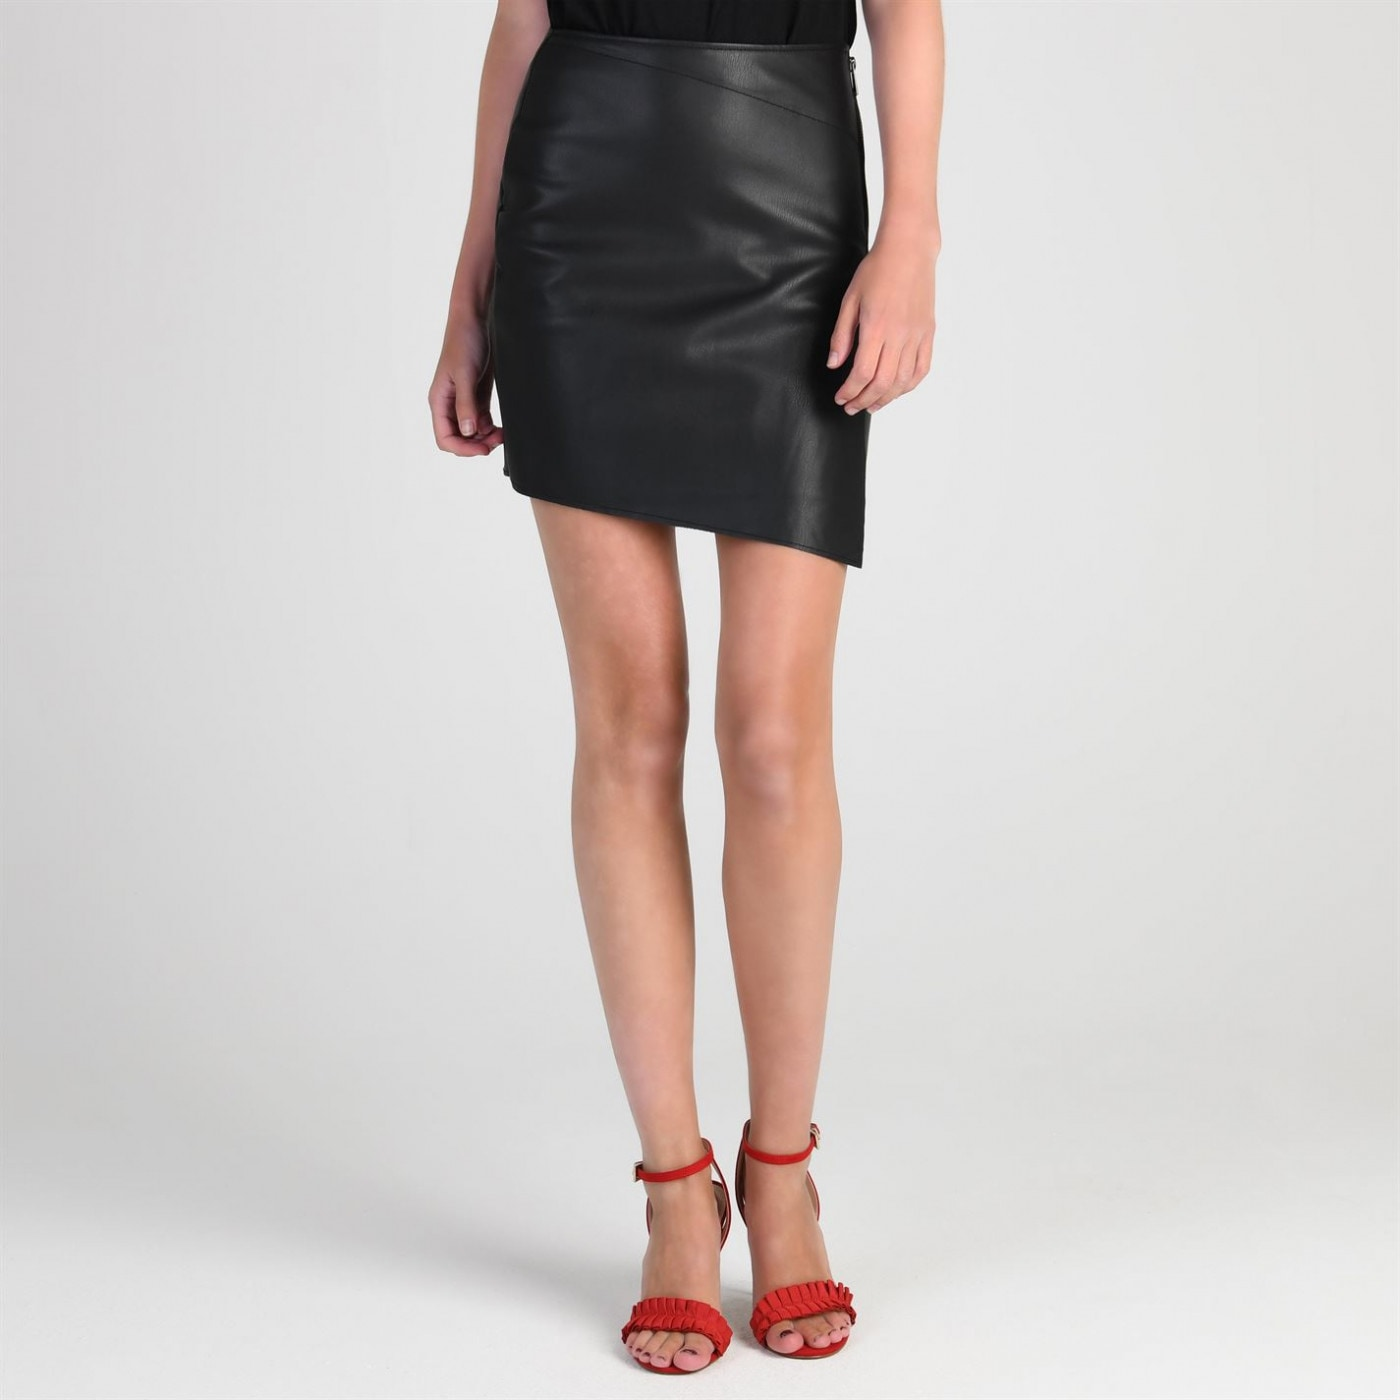 Firetrap Blackseal PU Skirt